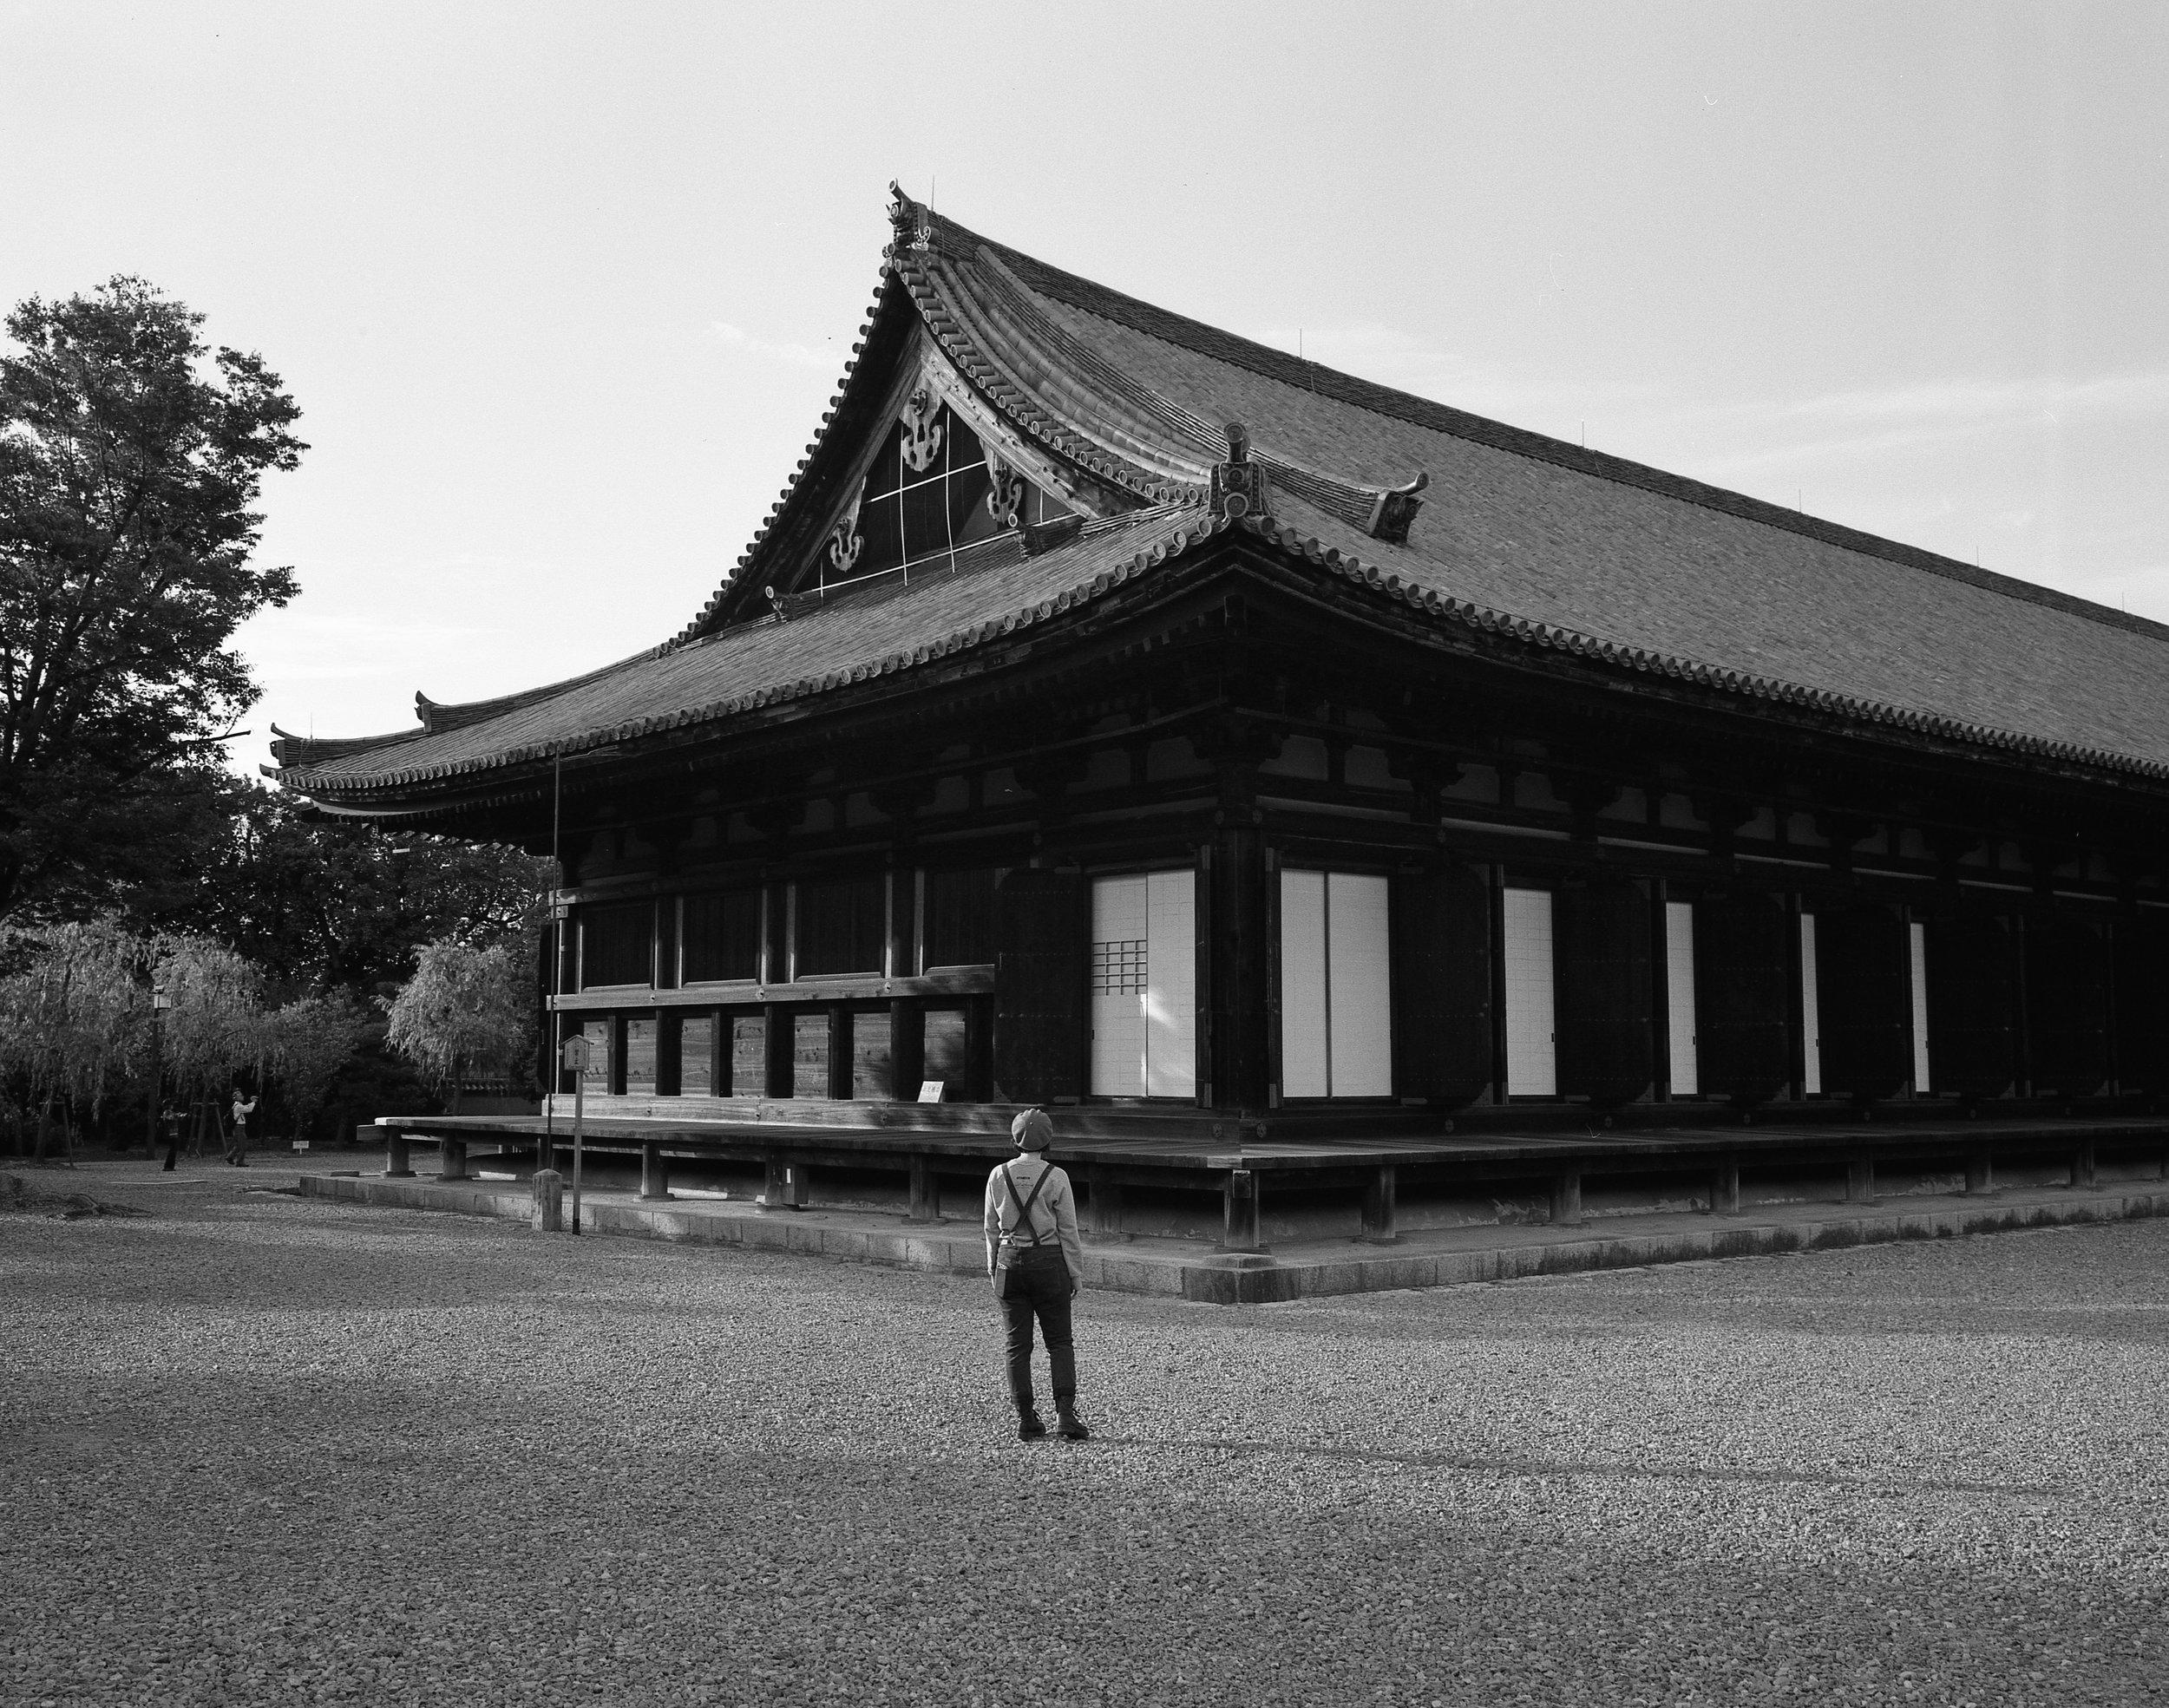 Sanjusangendo Buddhist Temple in Kyoto (Mamiya 7ii Ilford HP5+)